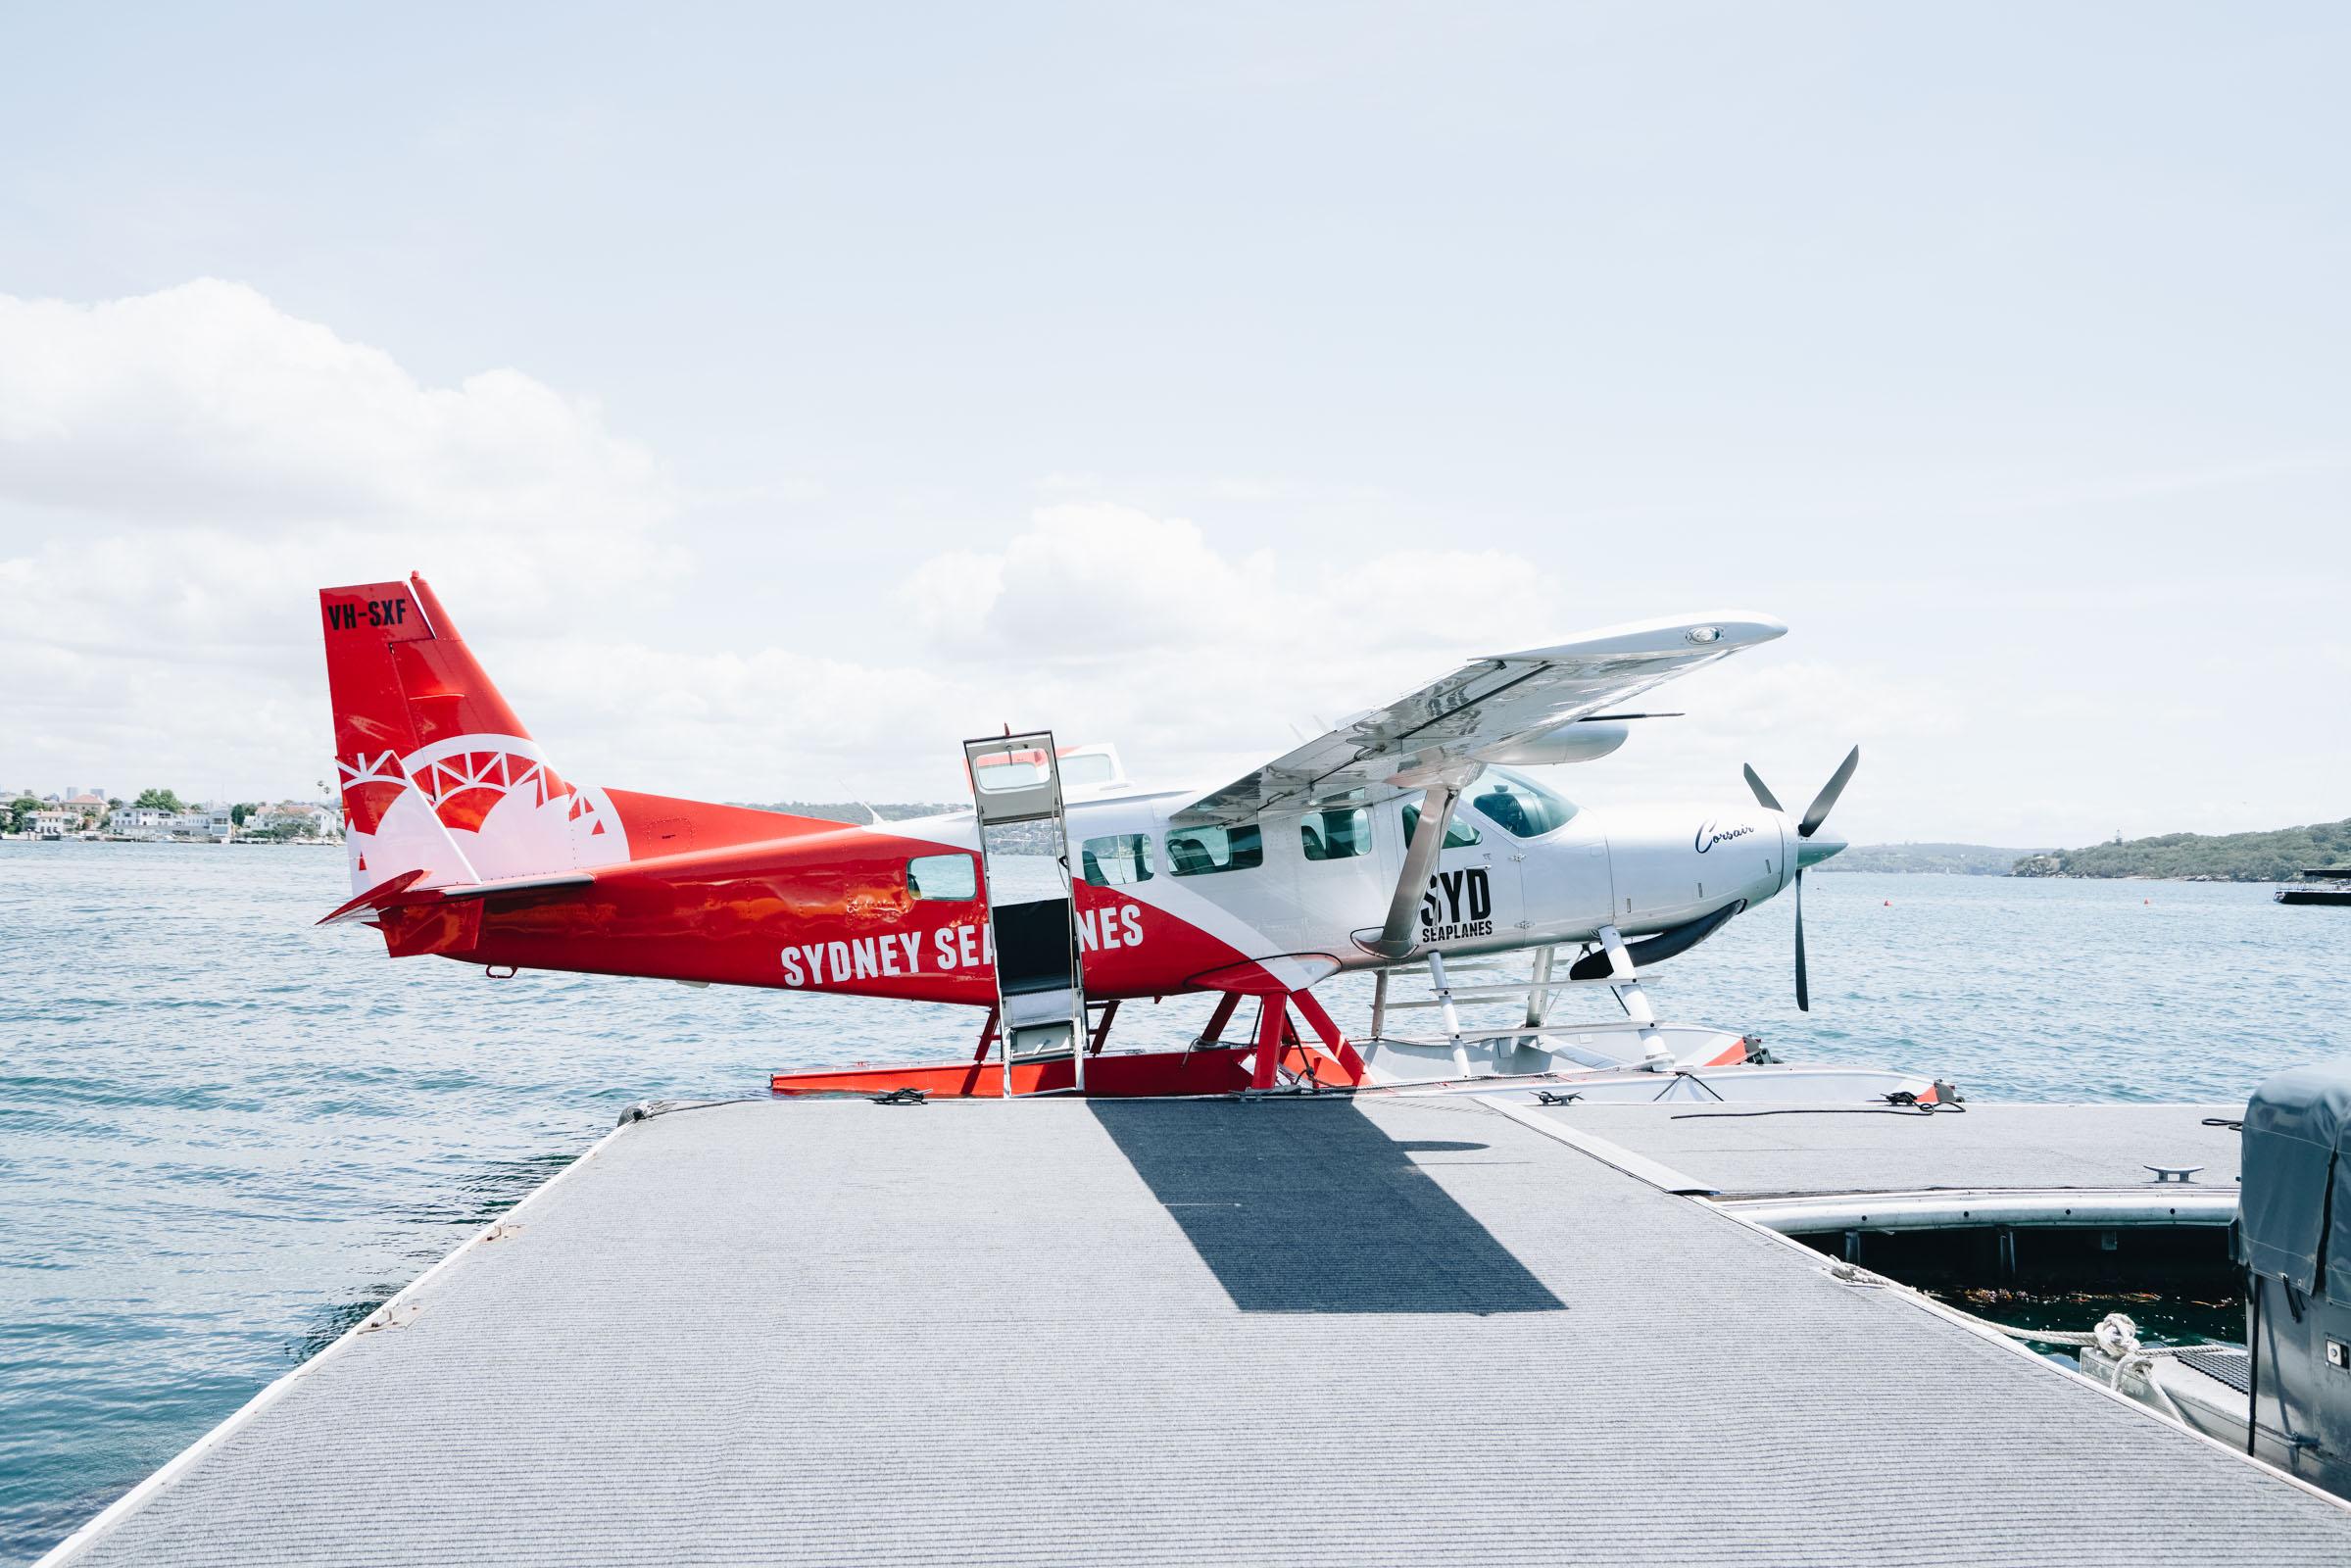 Rose Bay's Sydney Seaplane pontoon